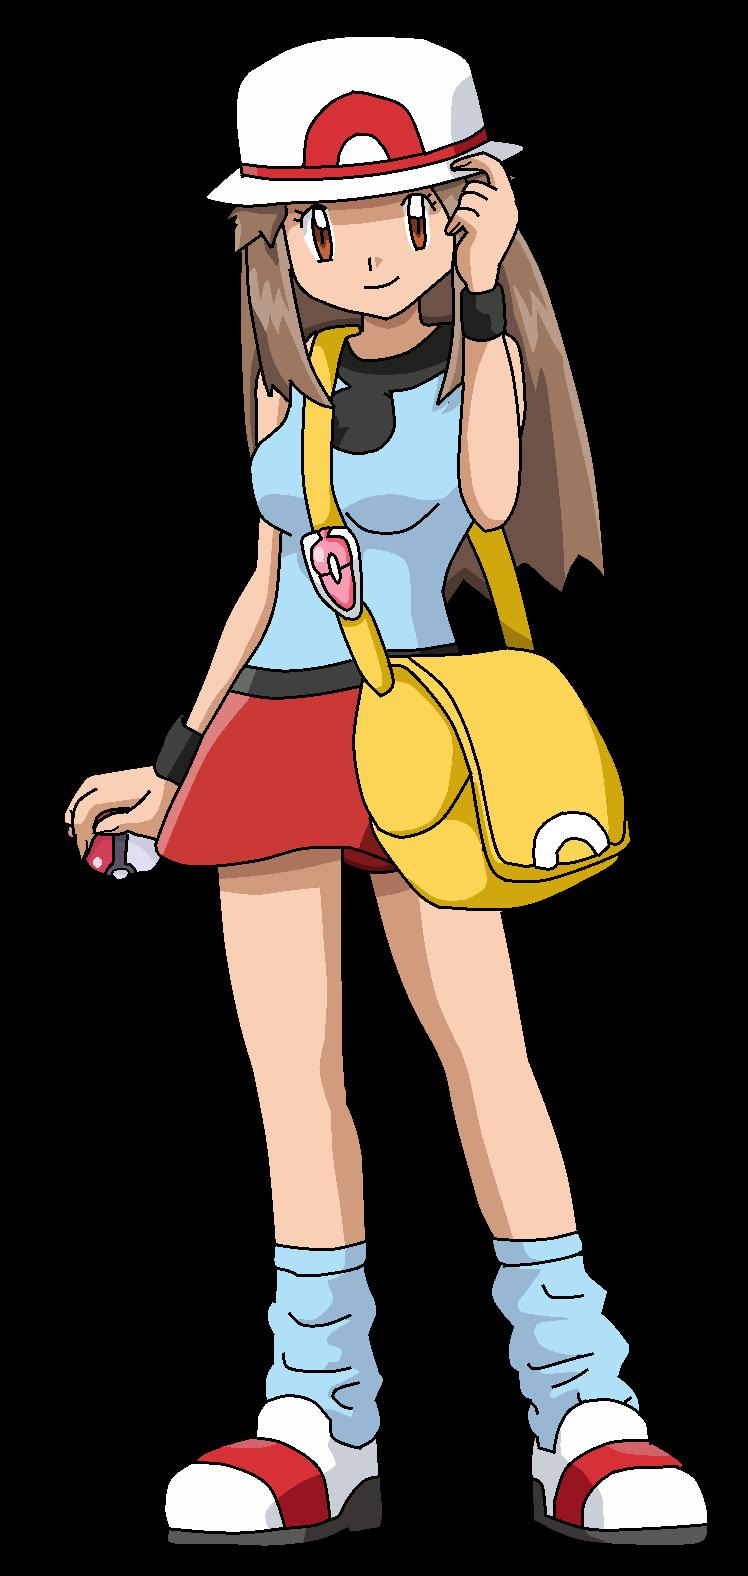 Anime Characters As Pokemon : Leaf pokemon anime artwork by aquamimi on deviantart